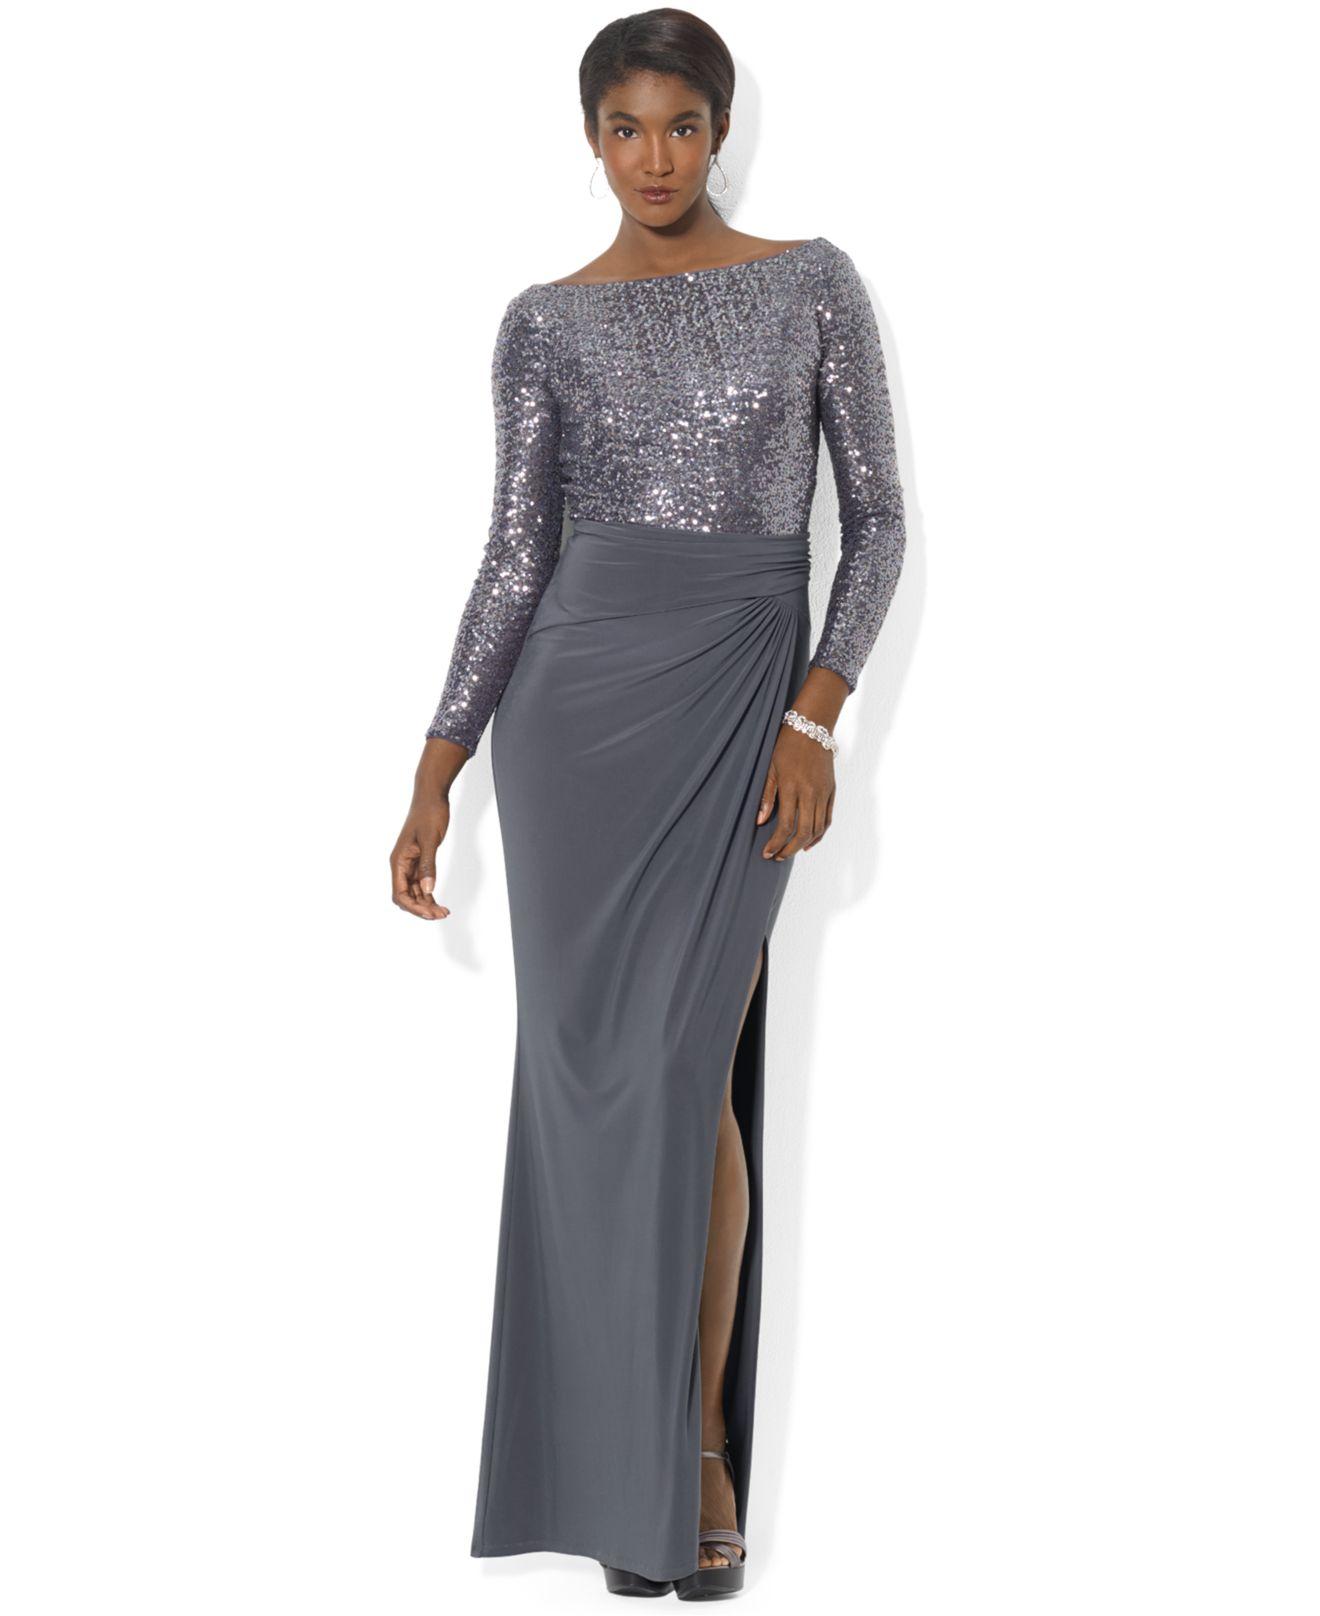 db895b6ed23 Ralph Lauren Plus Size Clothes Macys